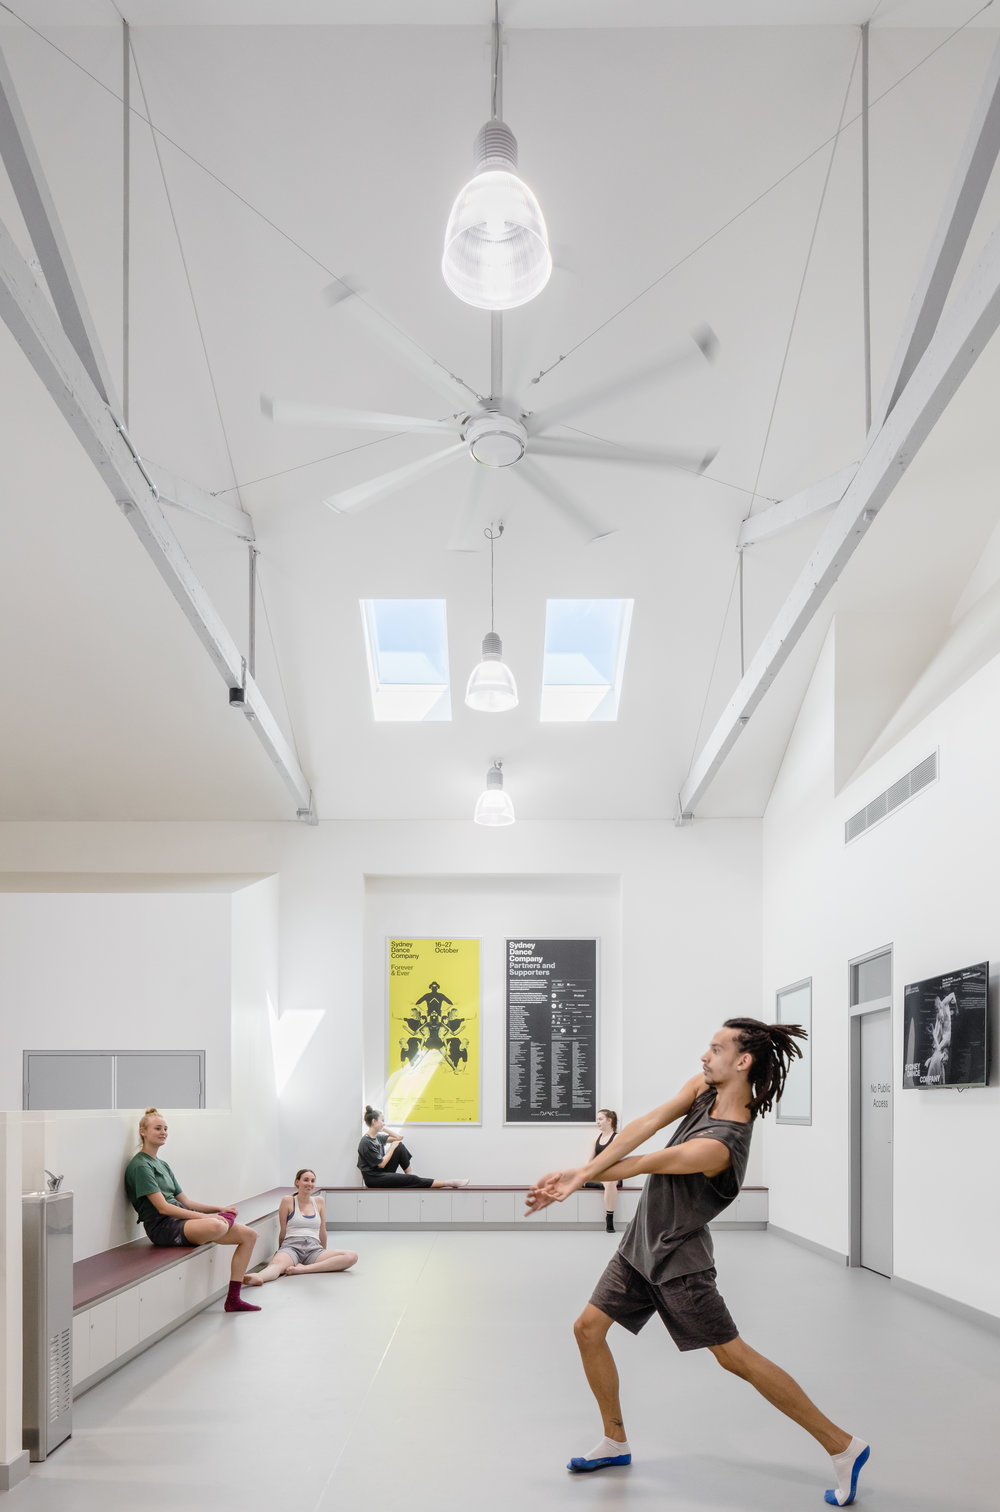 3114-interior_Sydney Dance Company Rehearsal Studios_ Dunn+HIllam Architects_Kat Lu photography_03.jpg